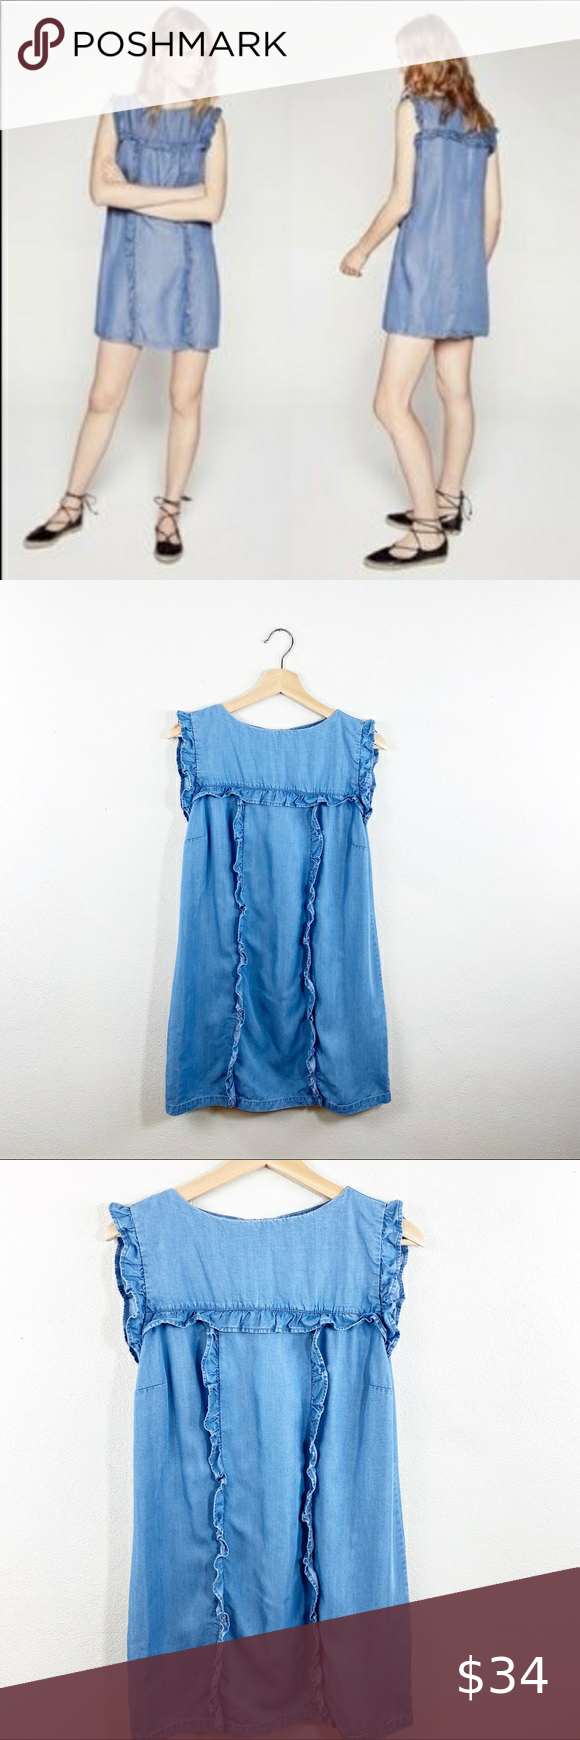 Zara Denim Tencel Chambray Ruffled Dress Ruffle Dress Dresses Fashion [ 1740 x 580 Pixel ]